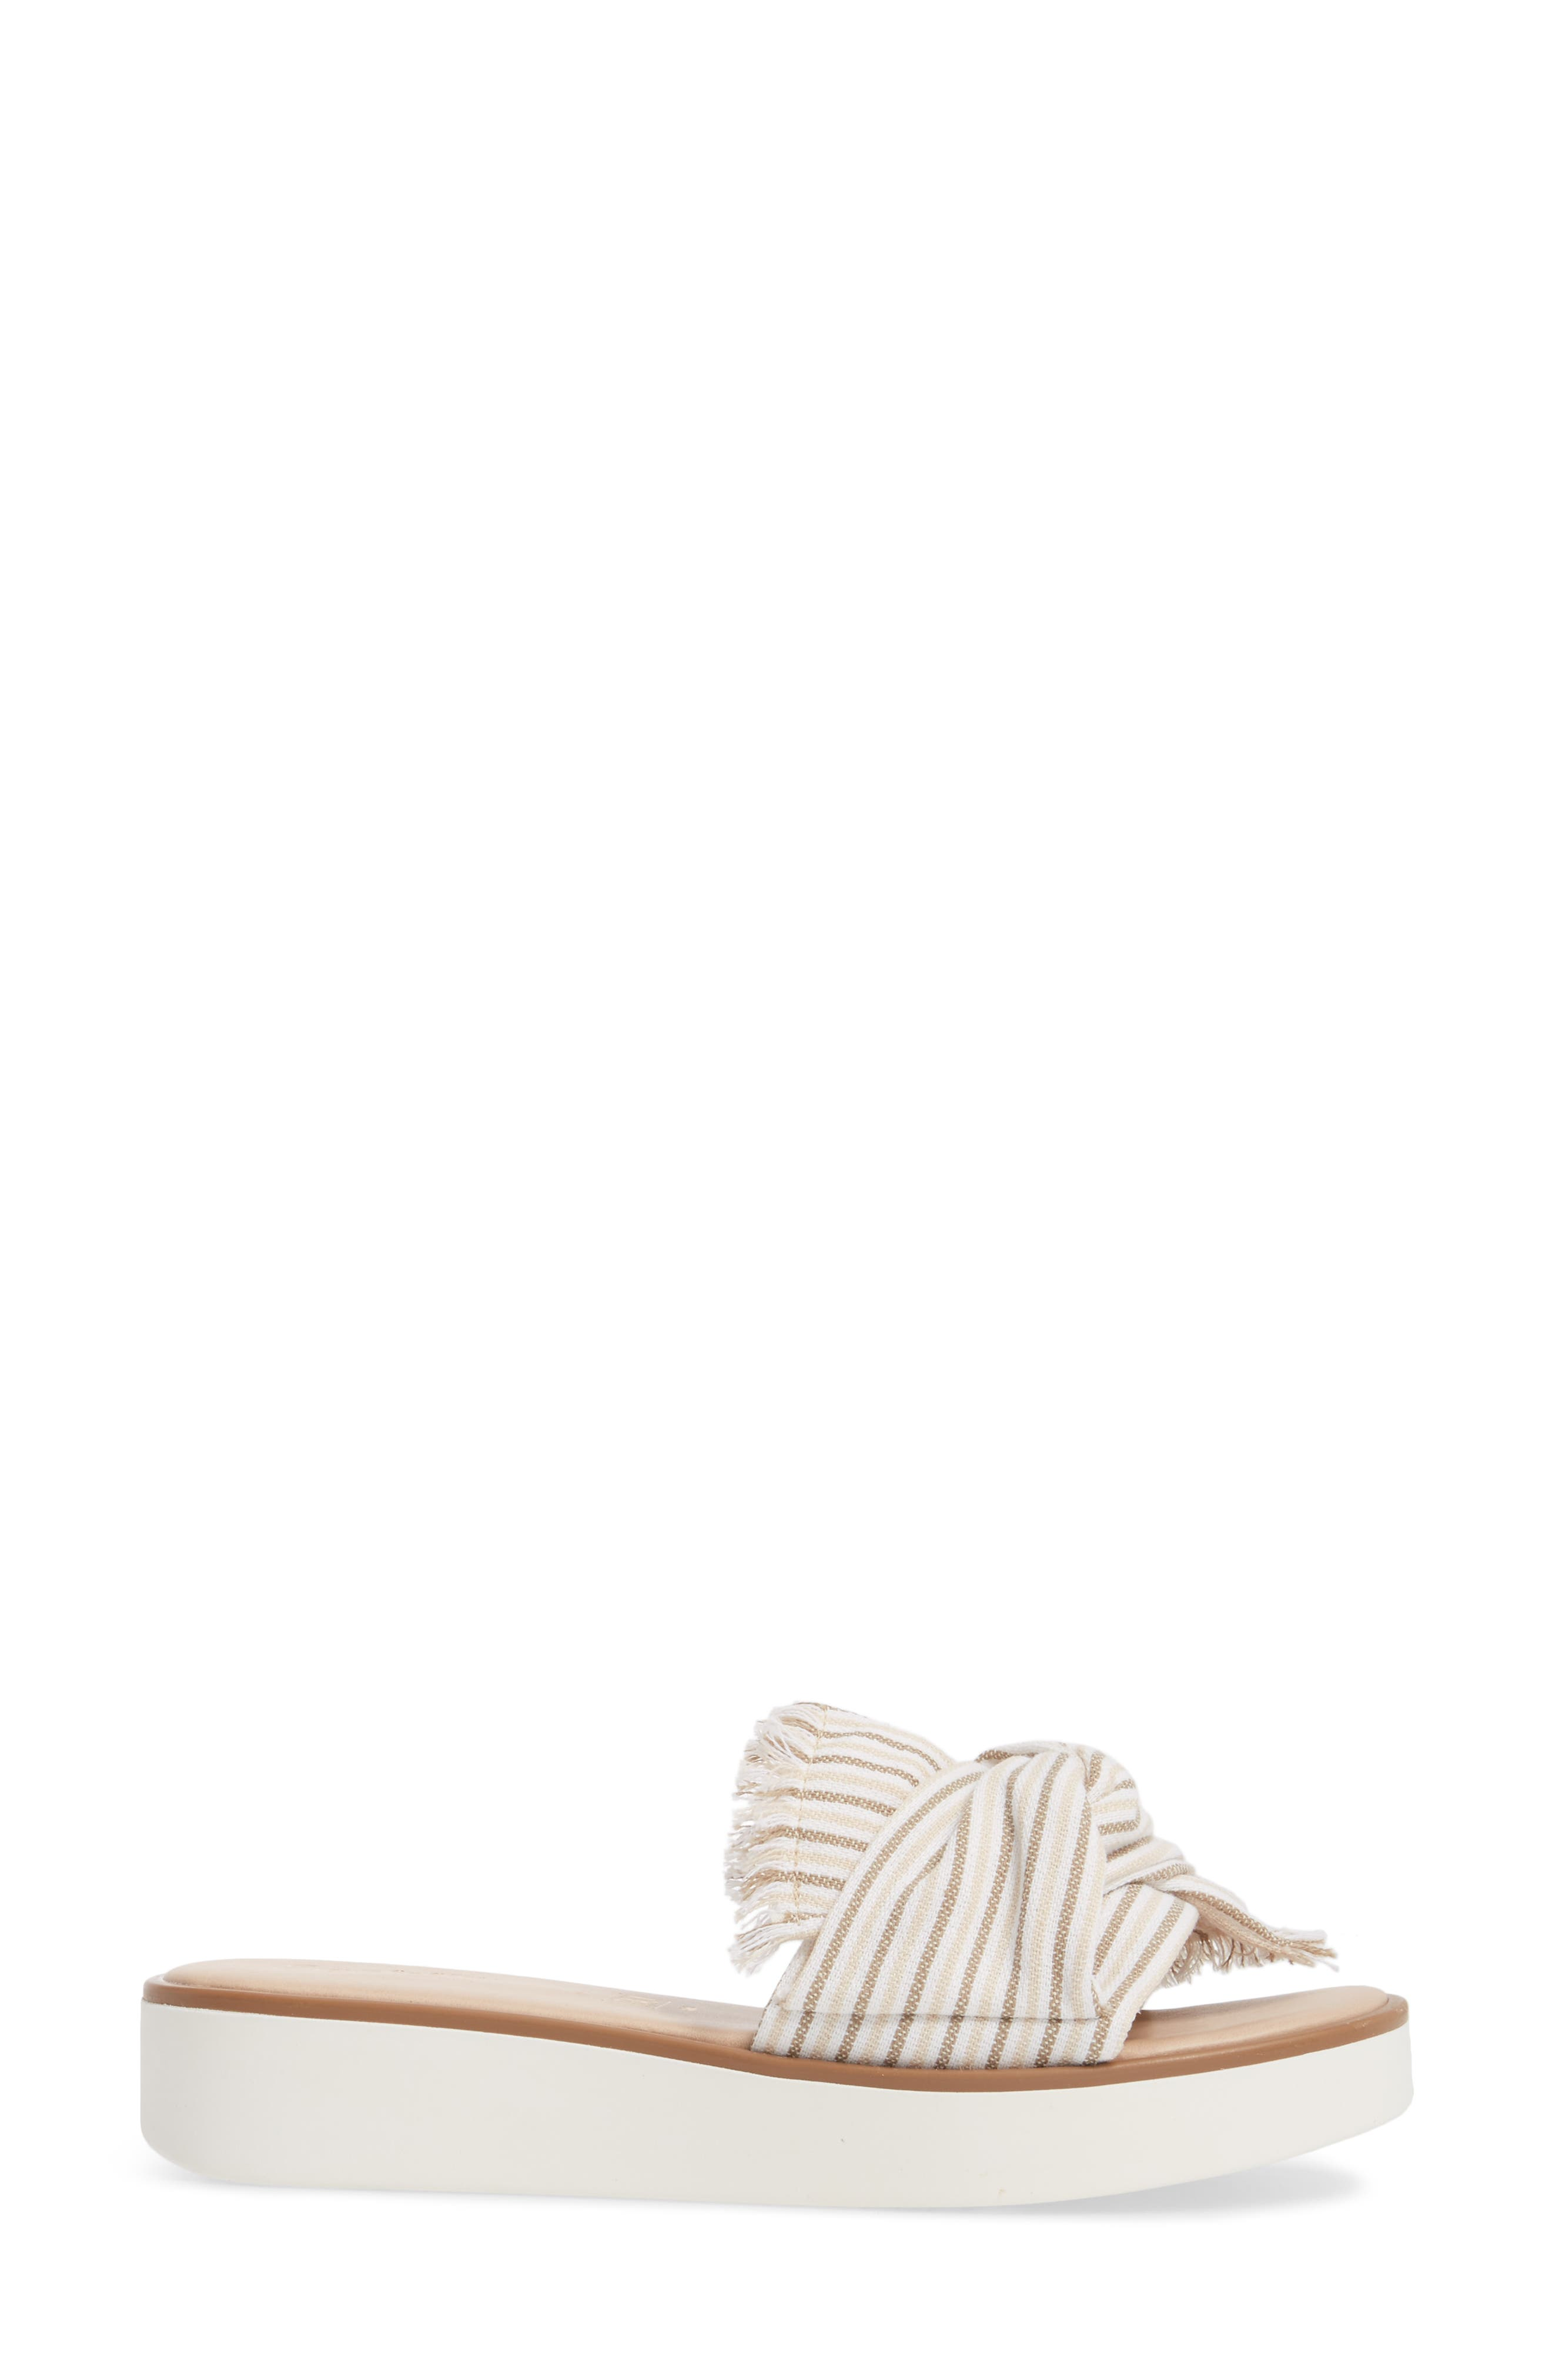 Coast II Slide Sandal,                             Alternate thumbnail 3, color,                             250